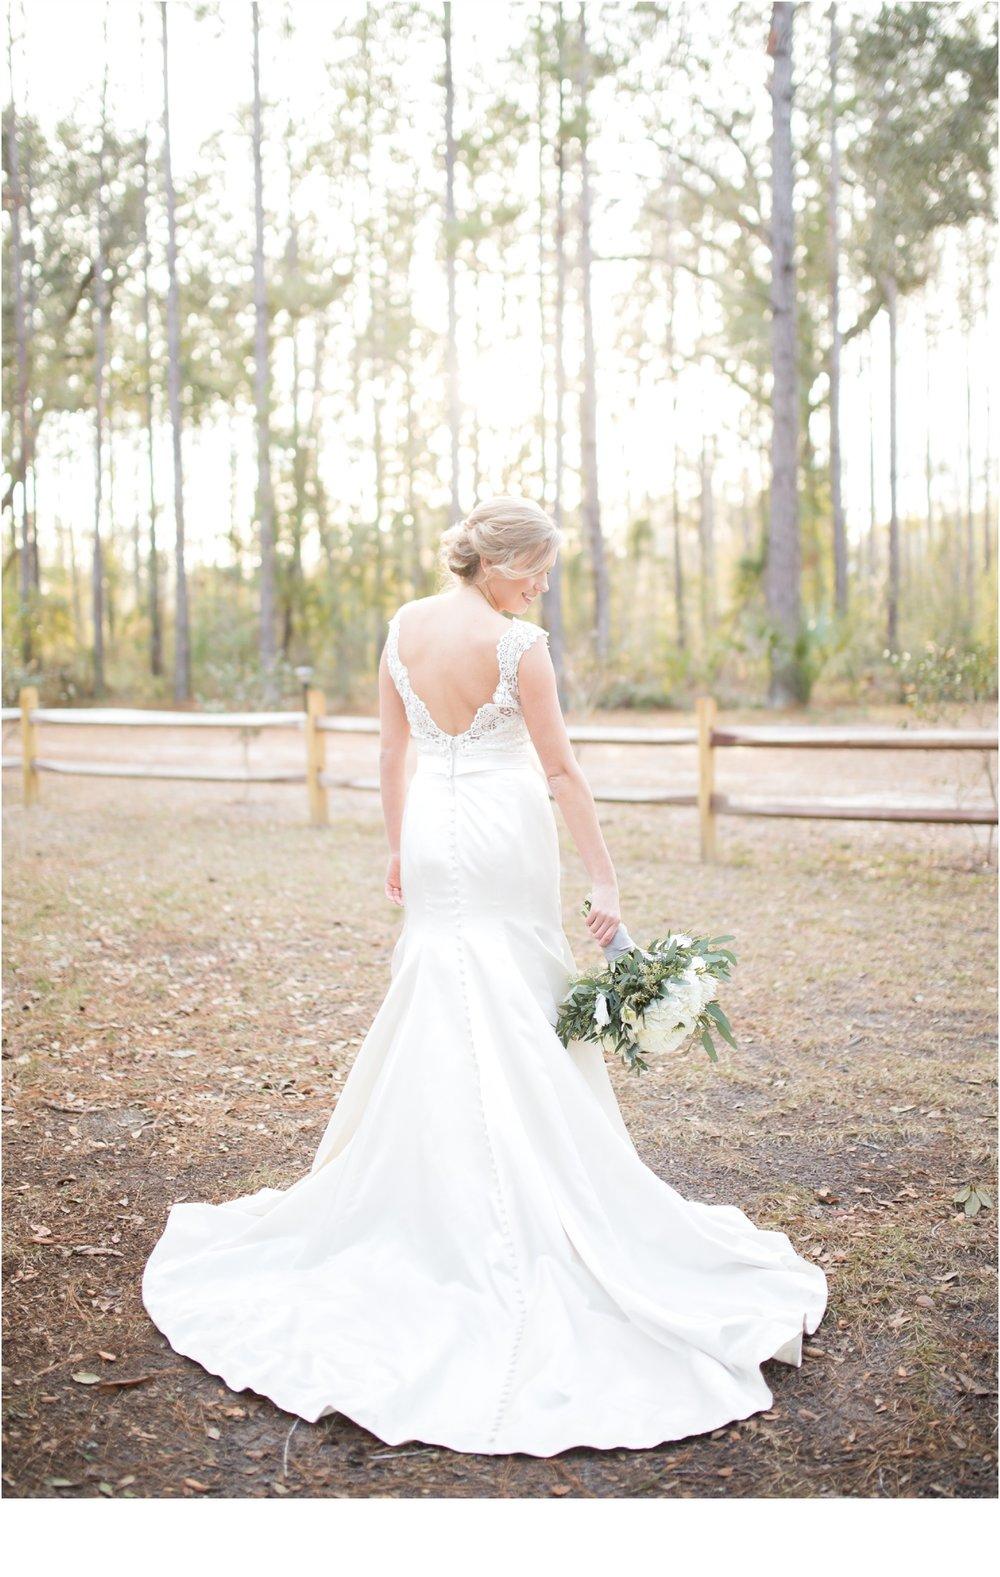 Rainey_Gregg_Photography_St._Simons_Island_Georgia_California_Wedding_Portrait_Photography_0505.jpg